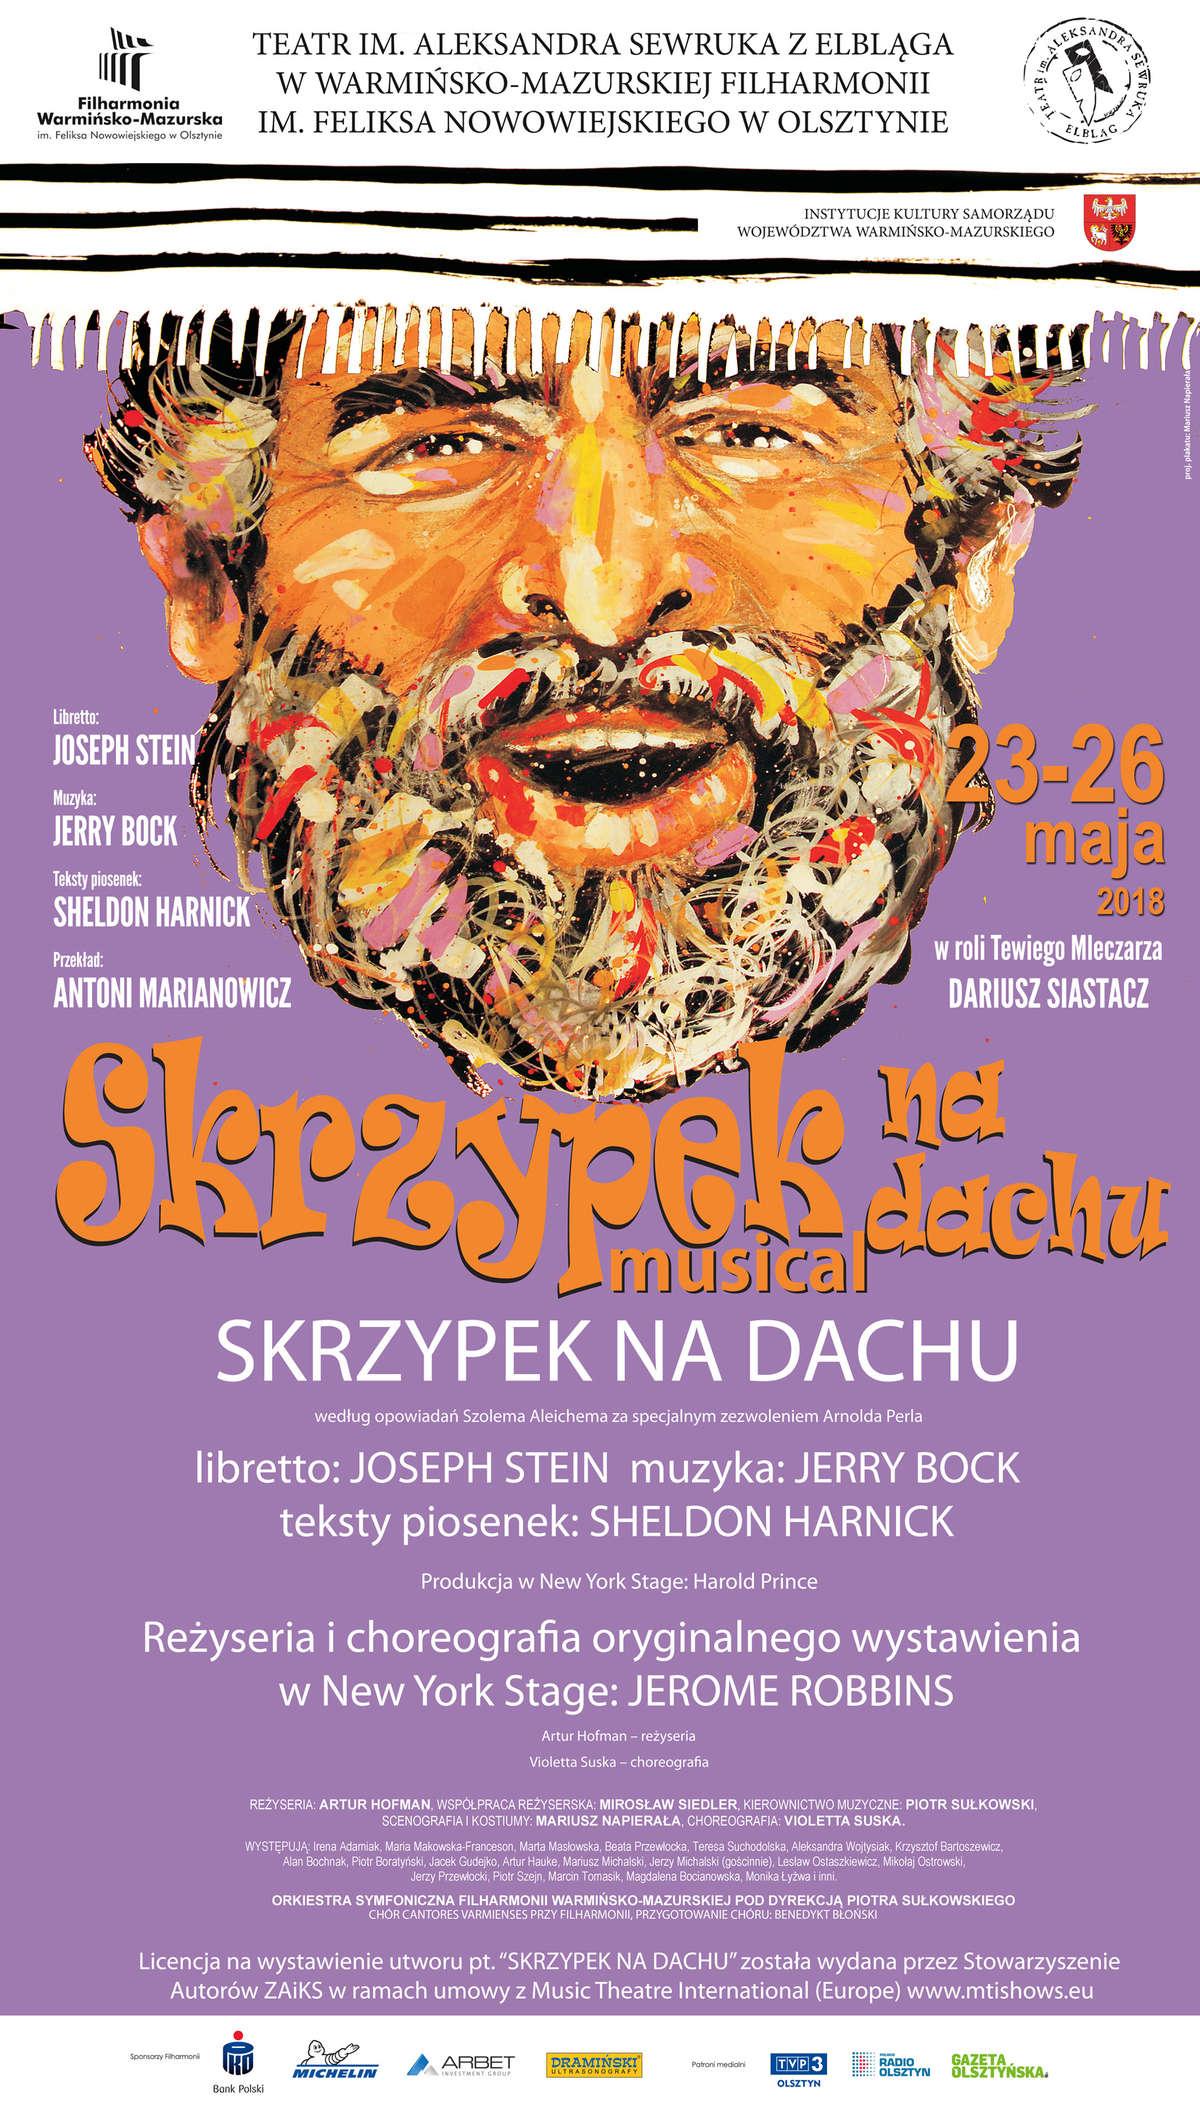 """Skrzypek na dachu"" w filharmonii - full image"